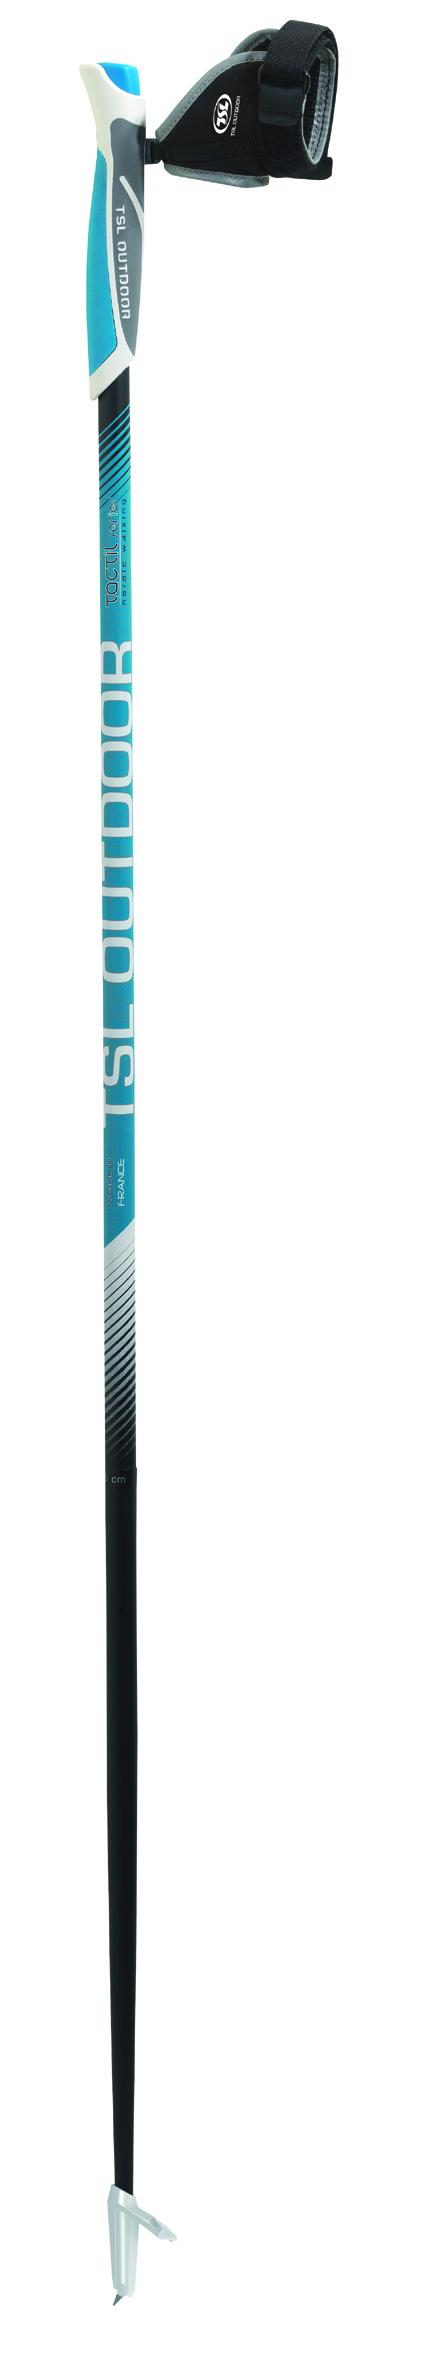 TSL Outdoor Tactil C20 Spike - Nordic-Walking-Stöcke